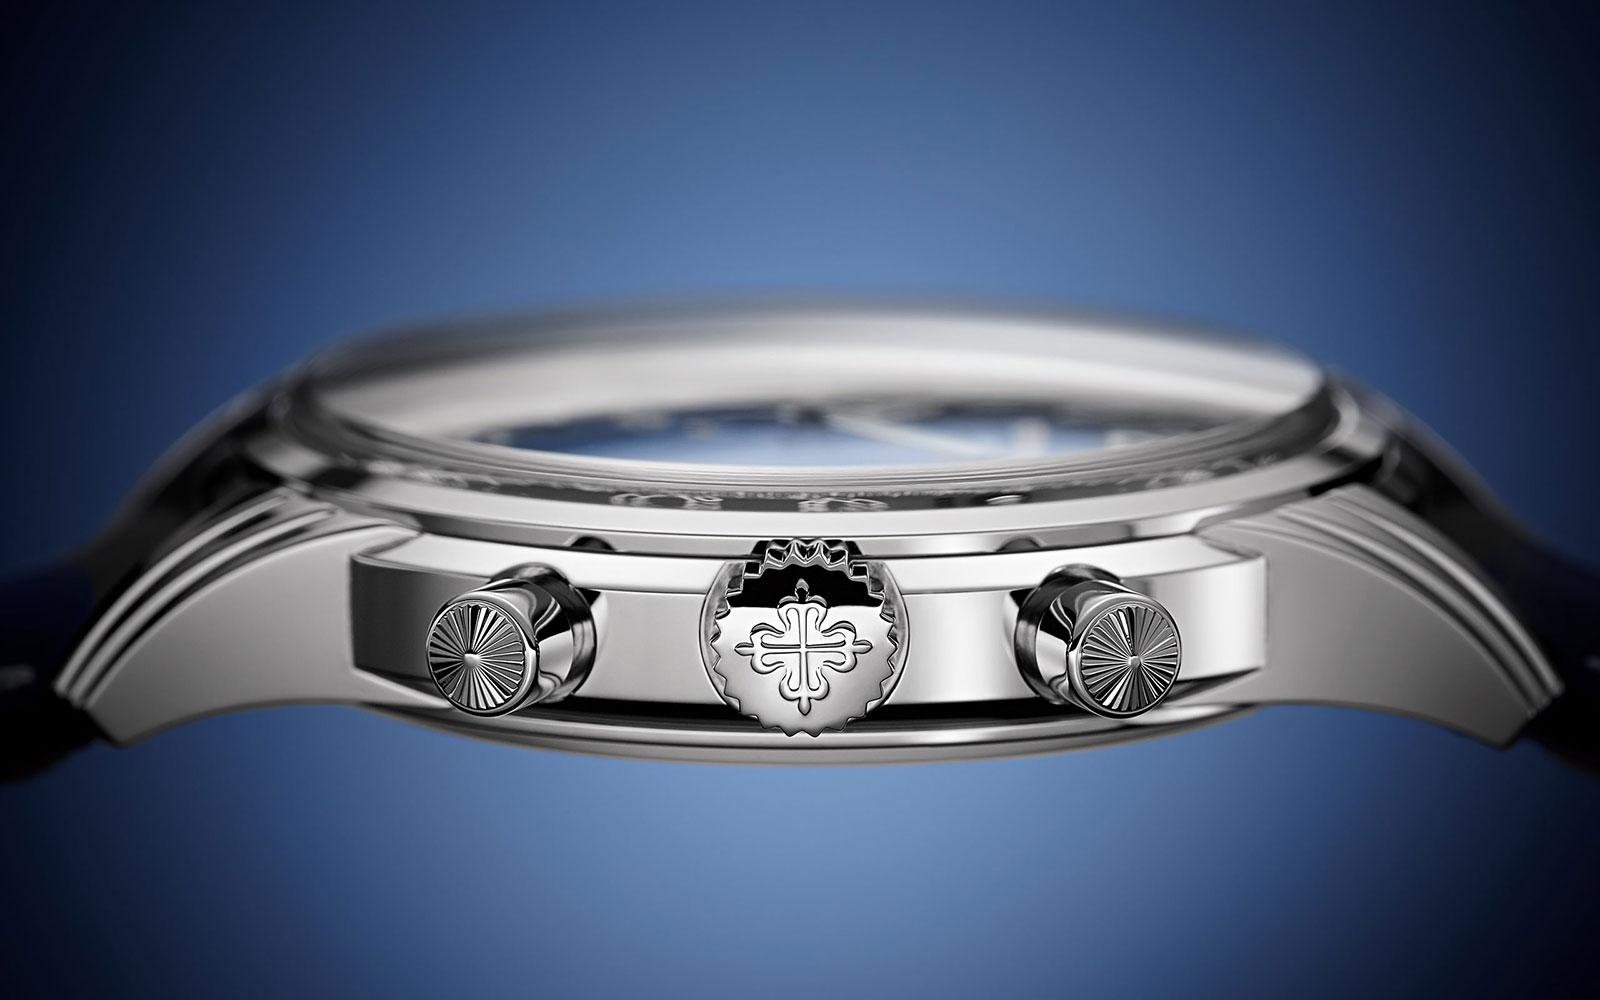 Patek Philippe Ref. 5172G chronograph 3